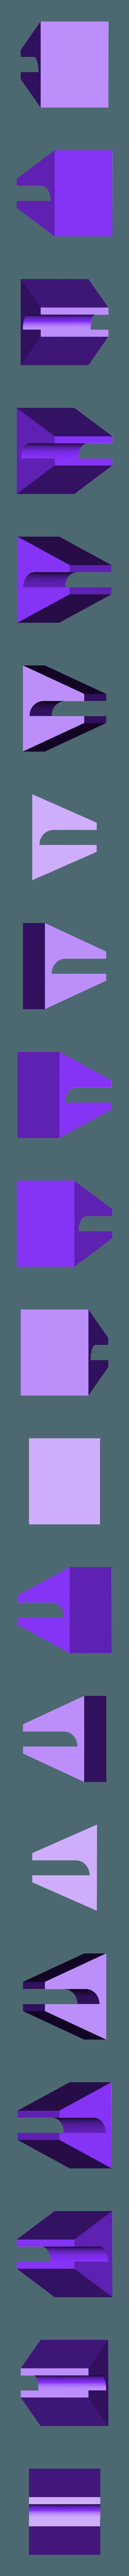 tiger eyes model foot.stl Télécharger fichier STL gratuit Tigre • Plan à imprimer en 3D, Renee_Taylor